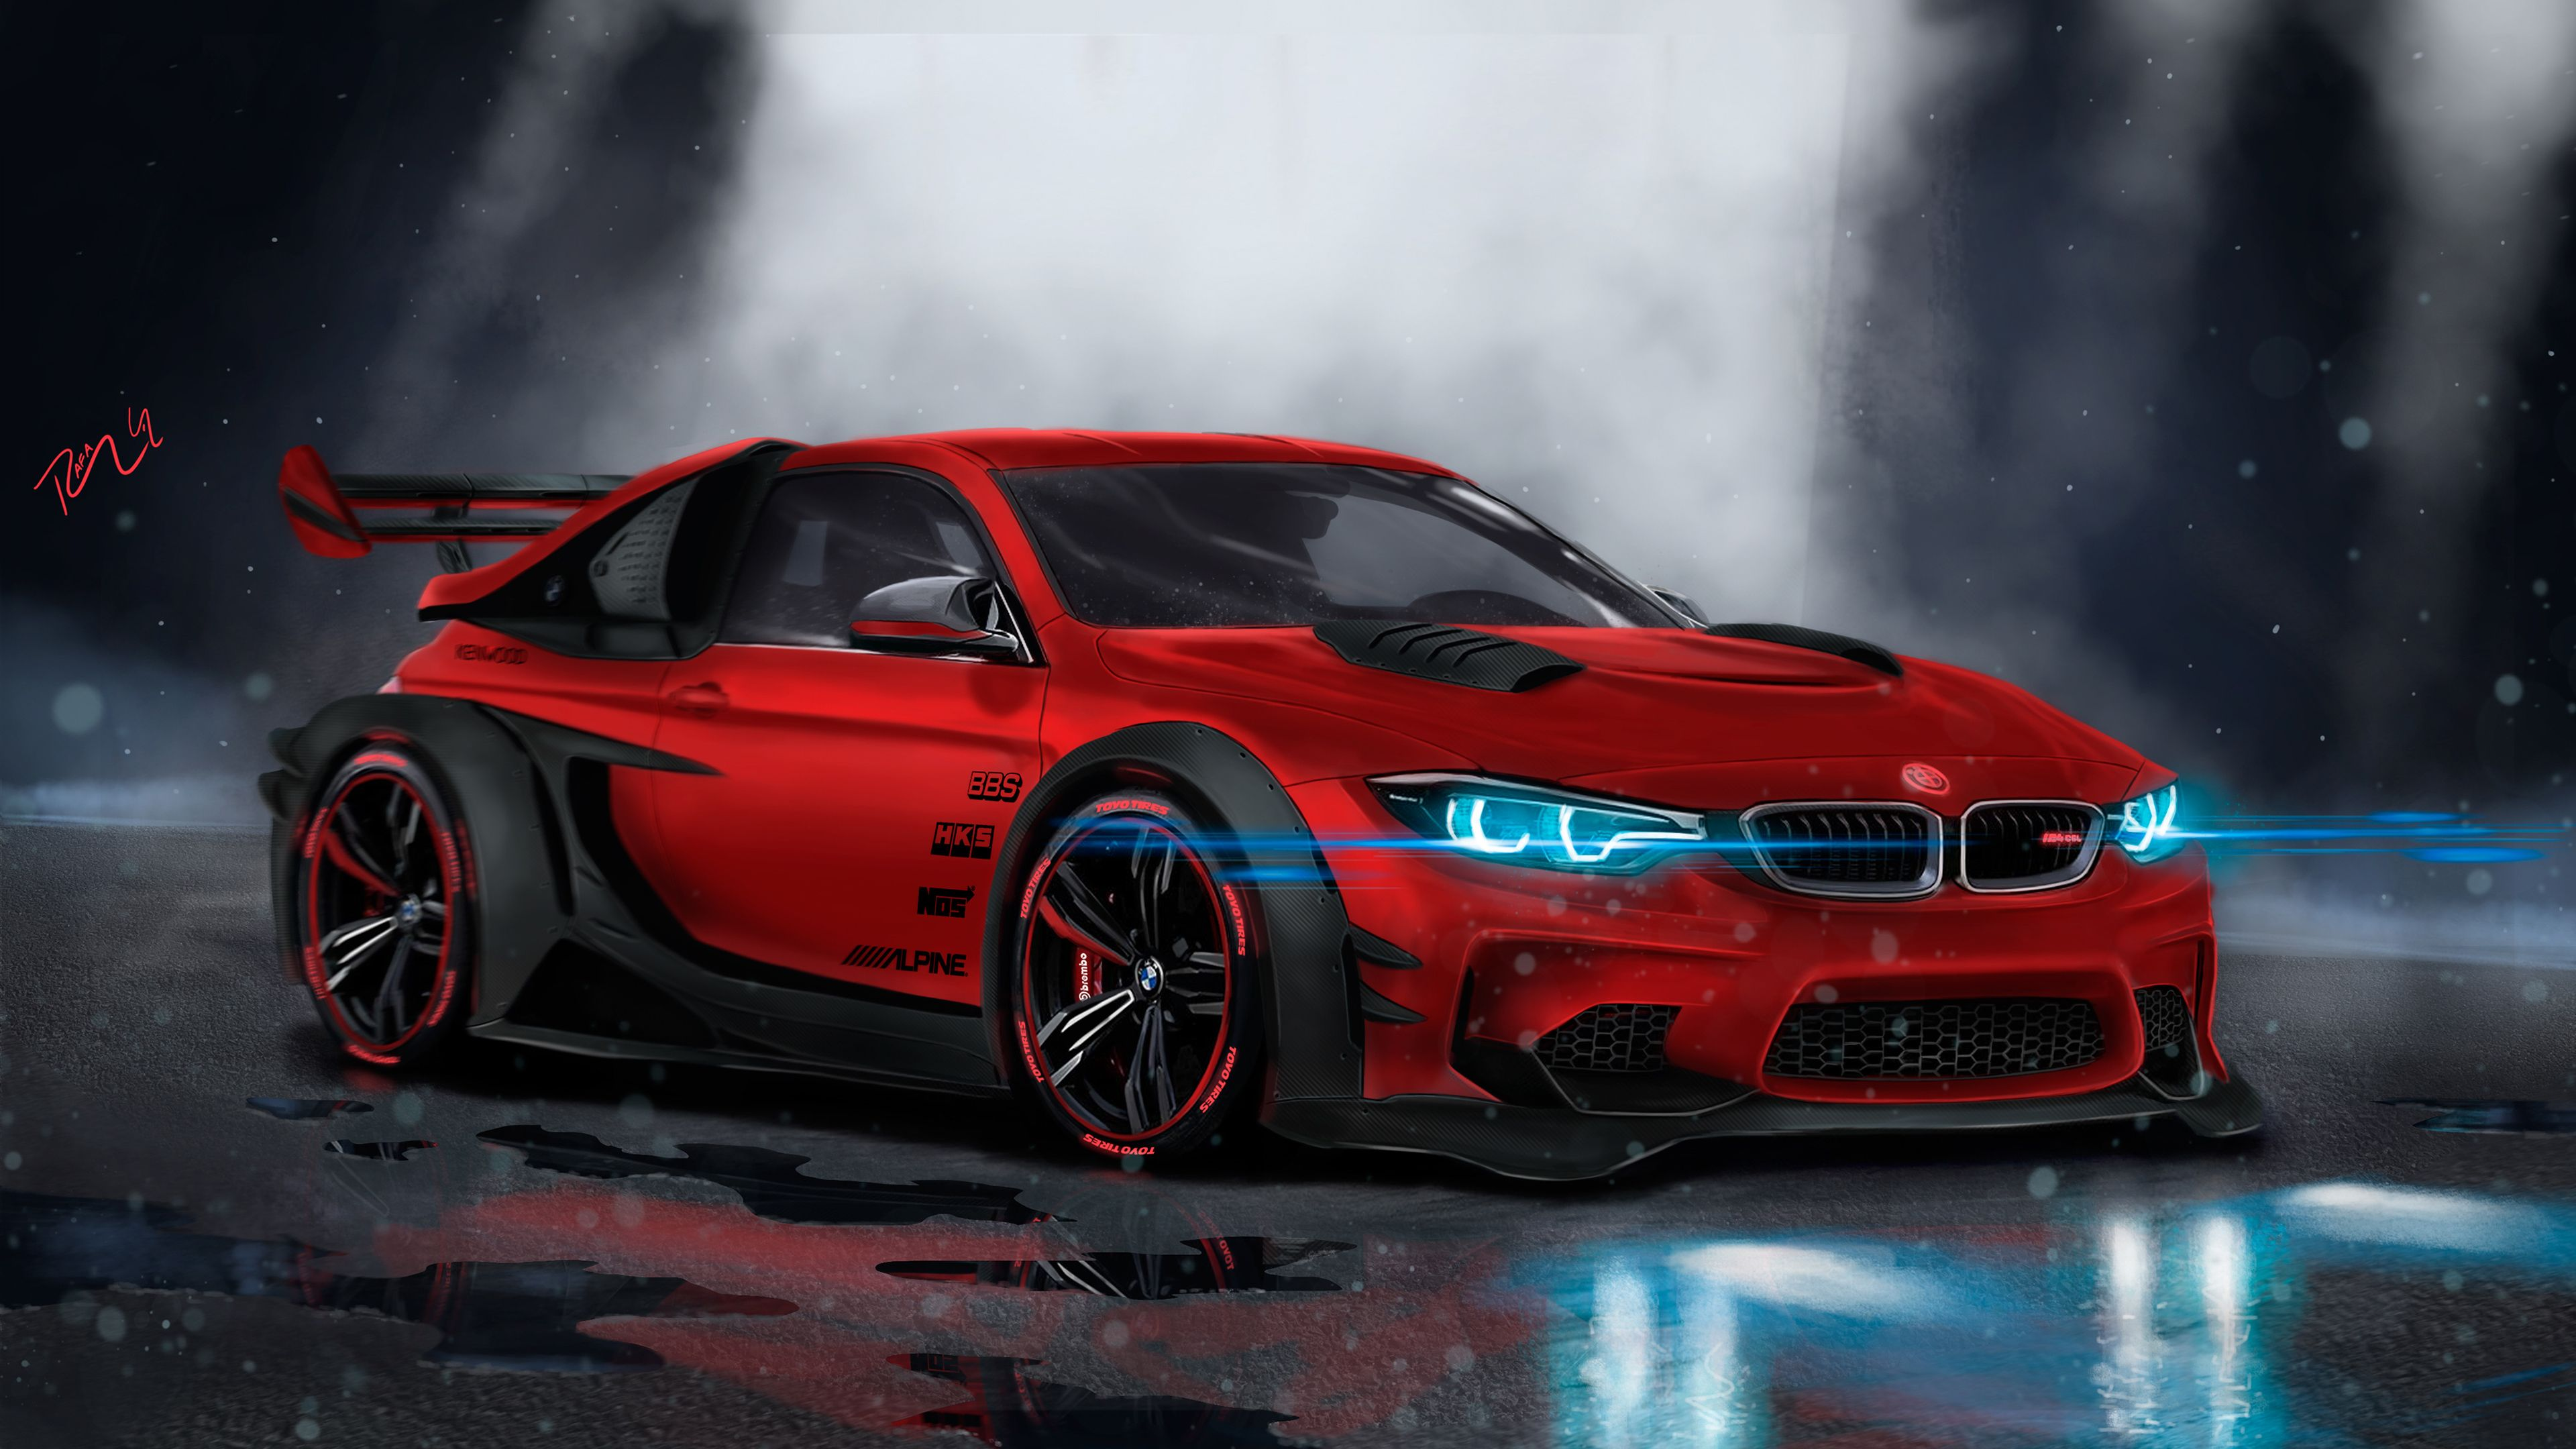 4K Car Wallpapers   Top 4K Car Backgrounds   WallpaperAccess 3840x2160